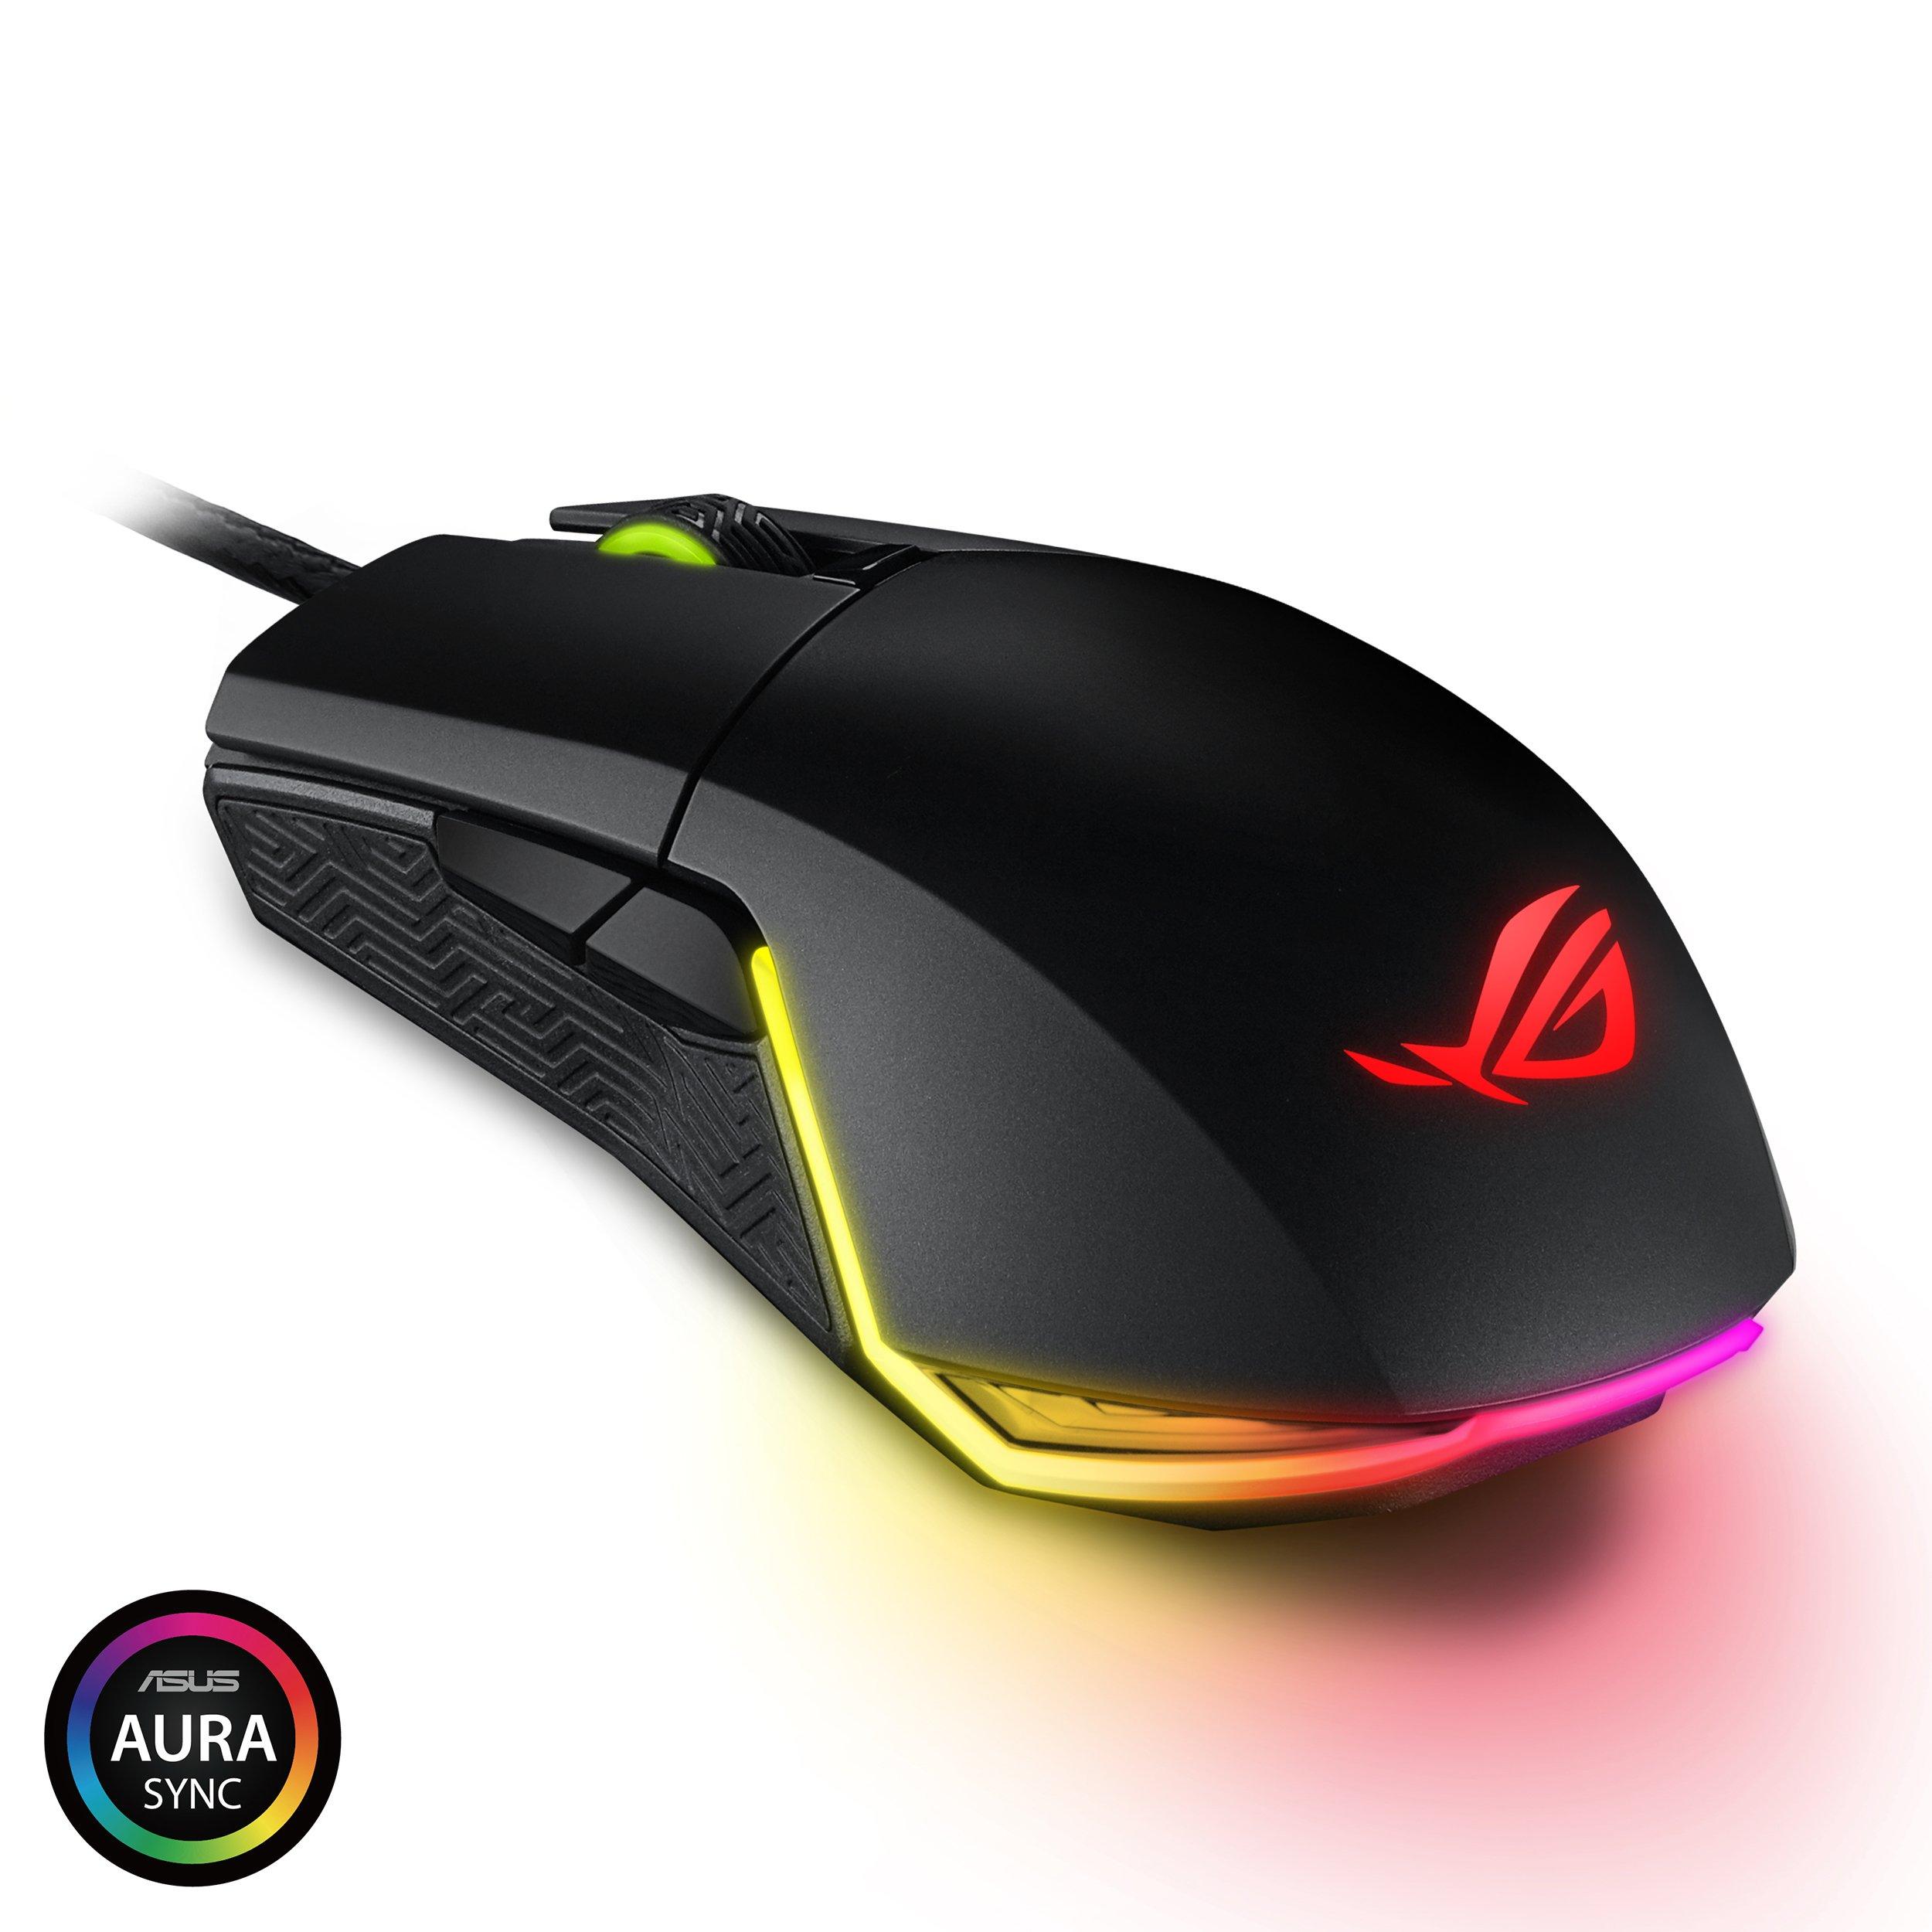 Mouse Gamer : Asus Rog Pugio Aura Rgb Usb Con Cable Optico